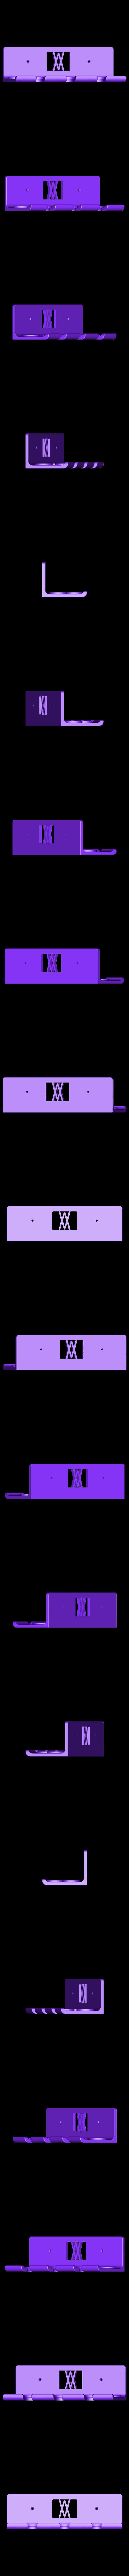 80225_screws.stl Download free STL file Socket Wrench Screwdriver Set 7pcs Tool Holder 013 I for screws or peg board • Design to 3D print, Wiesemann1893